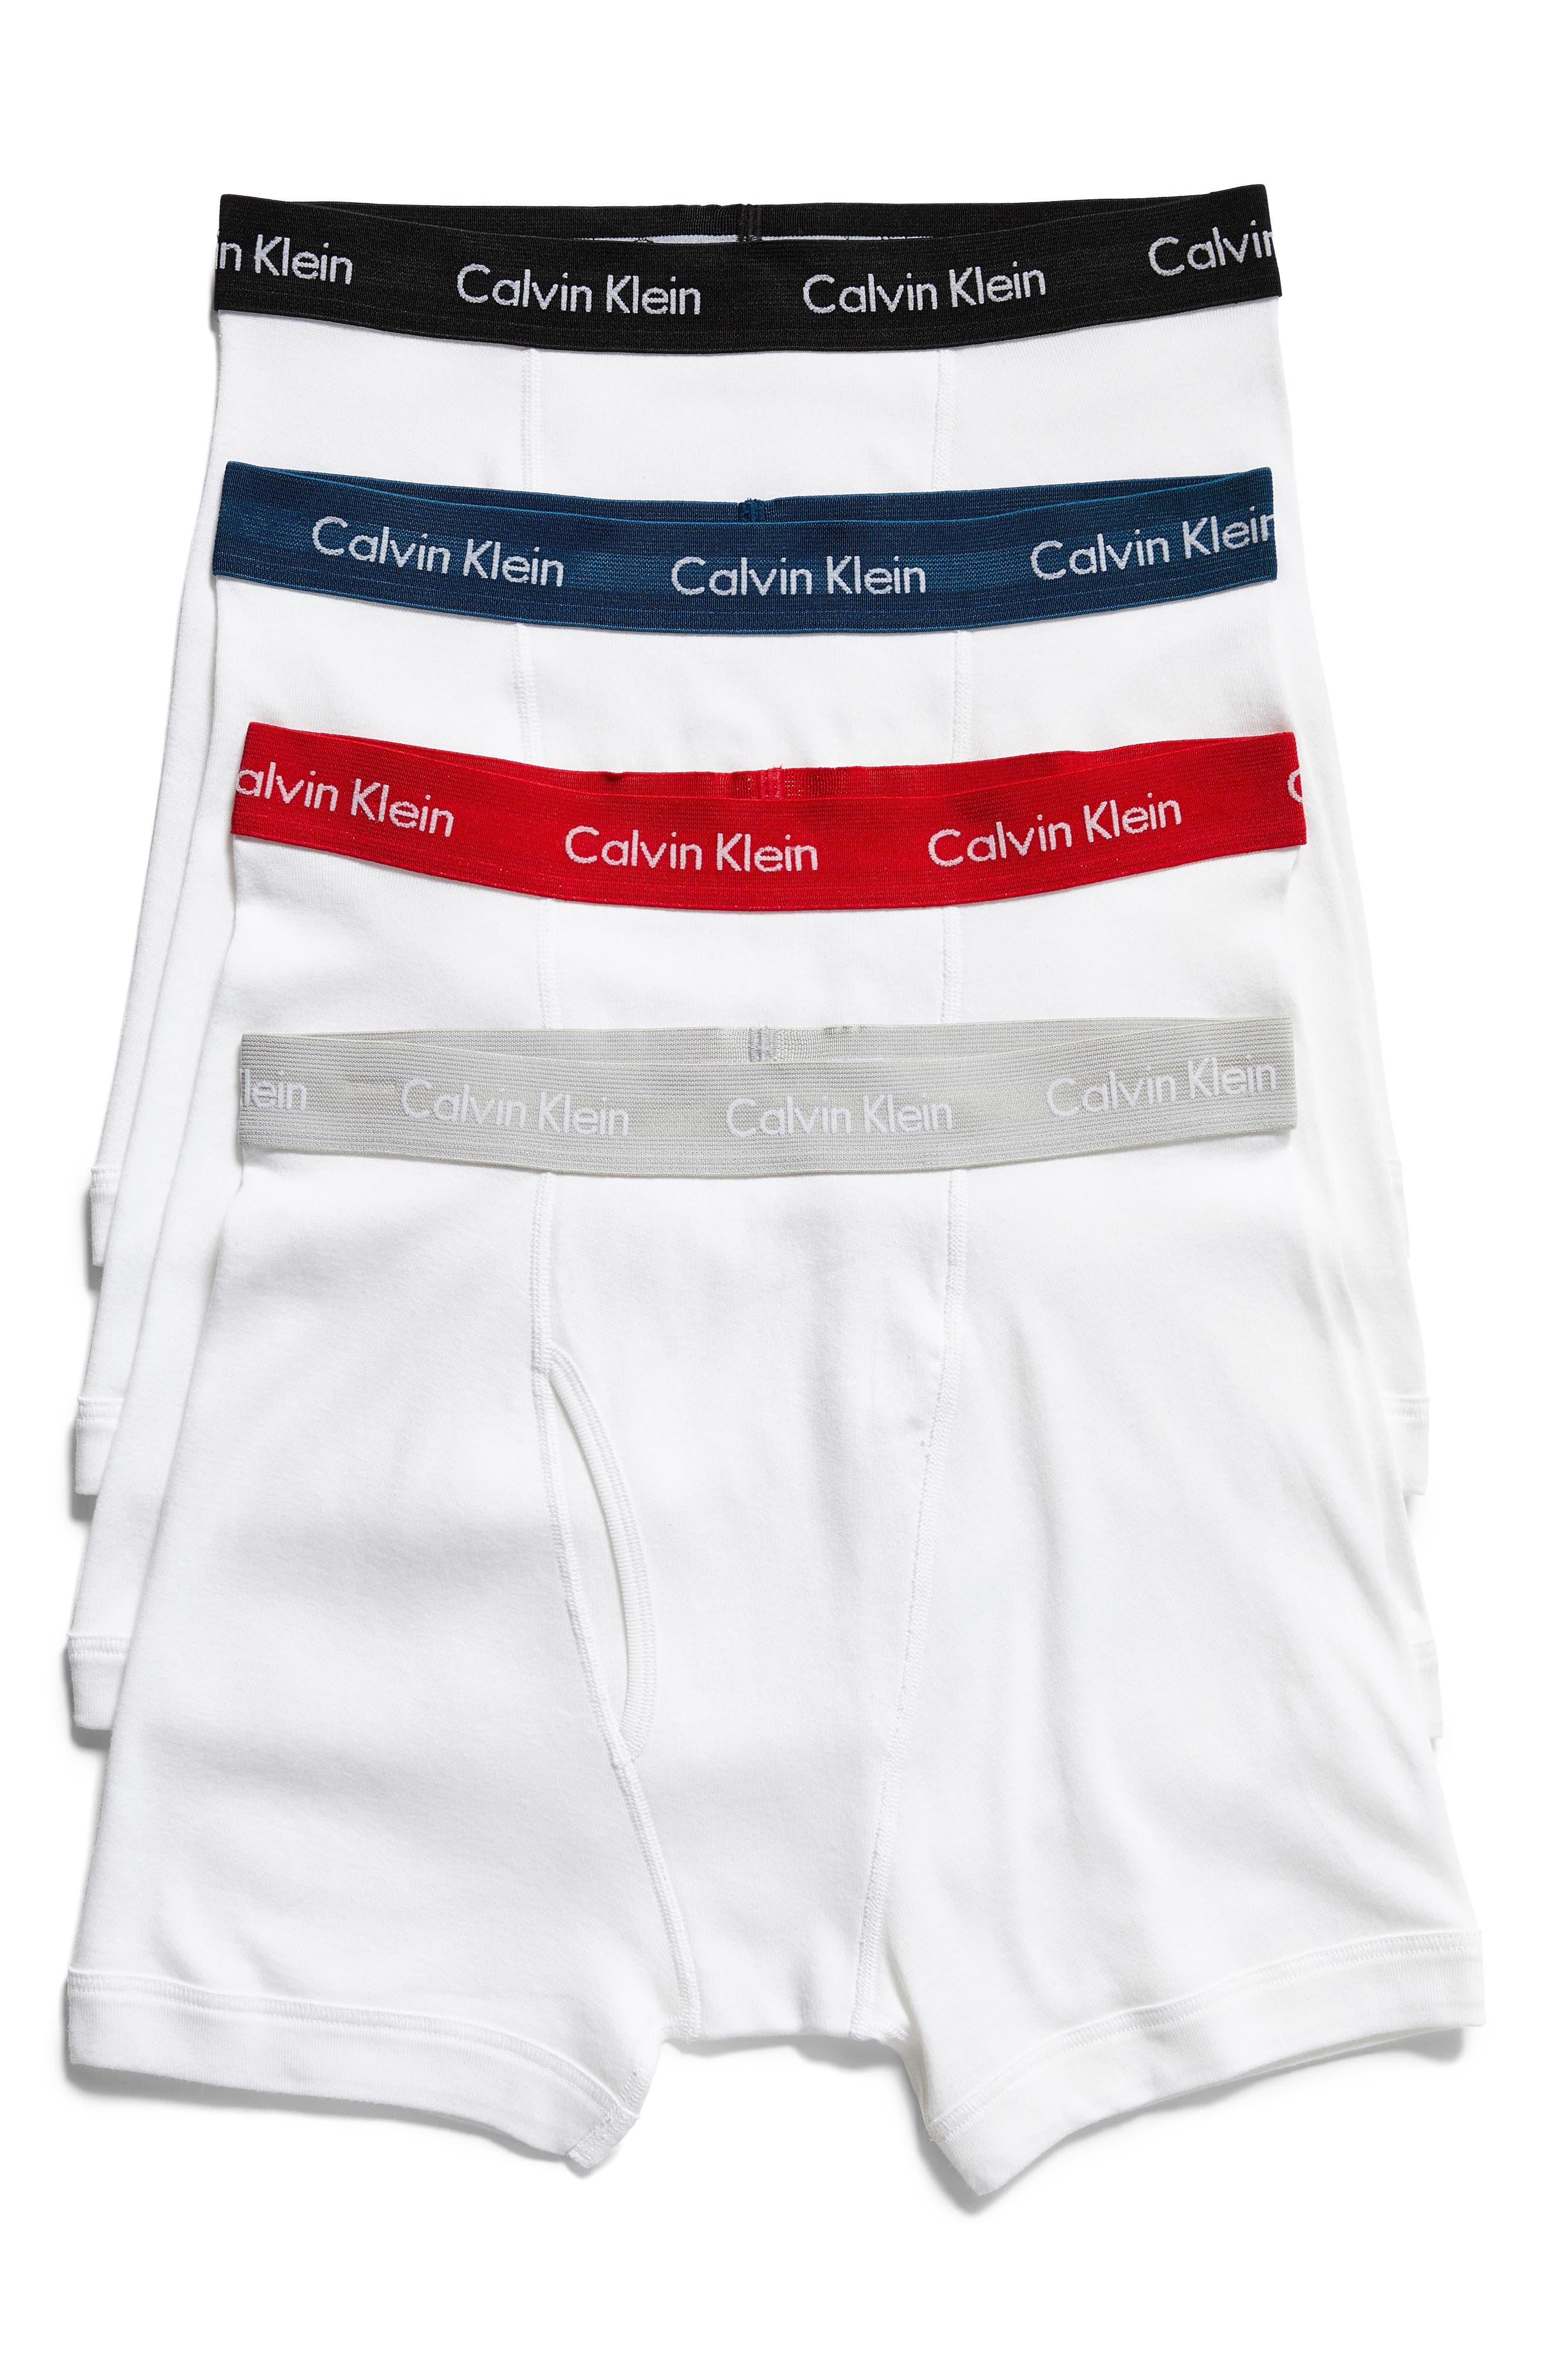 Main Image - Calvin Klein Classic 4-Pack Cotton Boxer Briefs